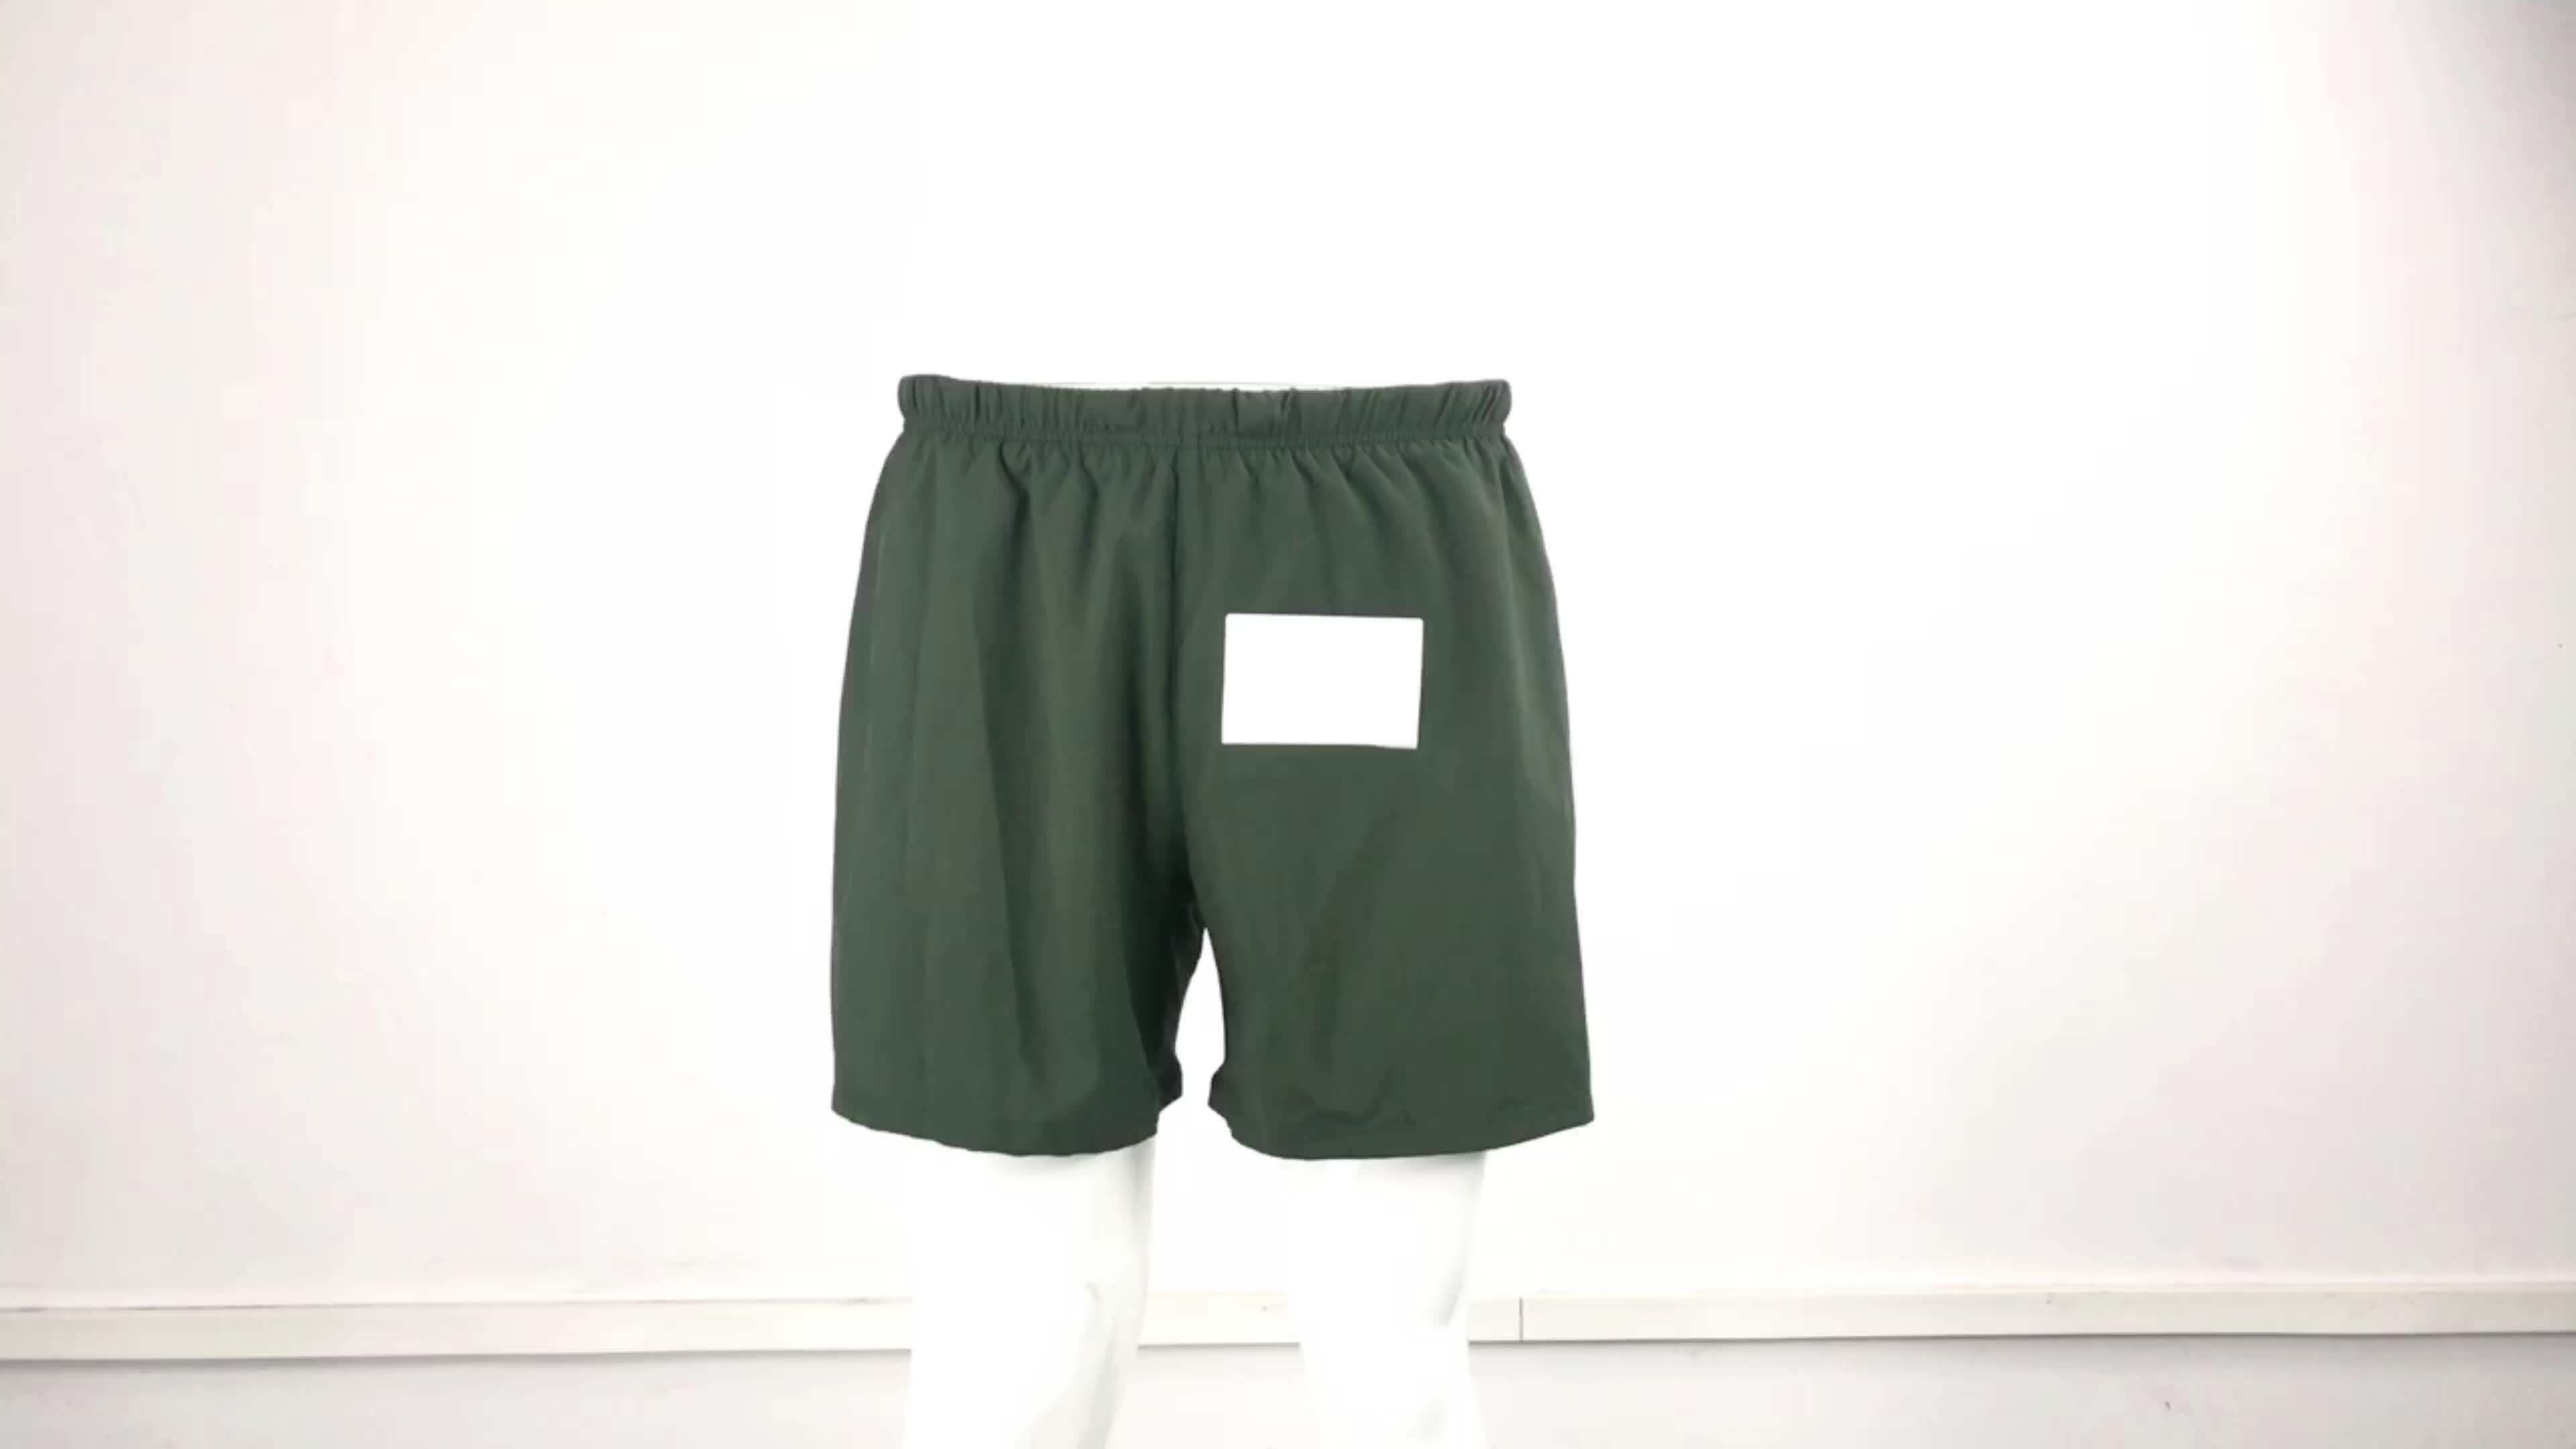 OEM 망 스판덱스 숏 스포츠 Gym Shorts Pants 꽉 Men's 레깅스 공장 Custom 도매